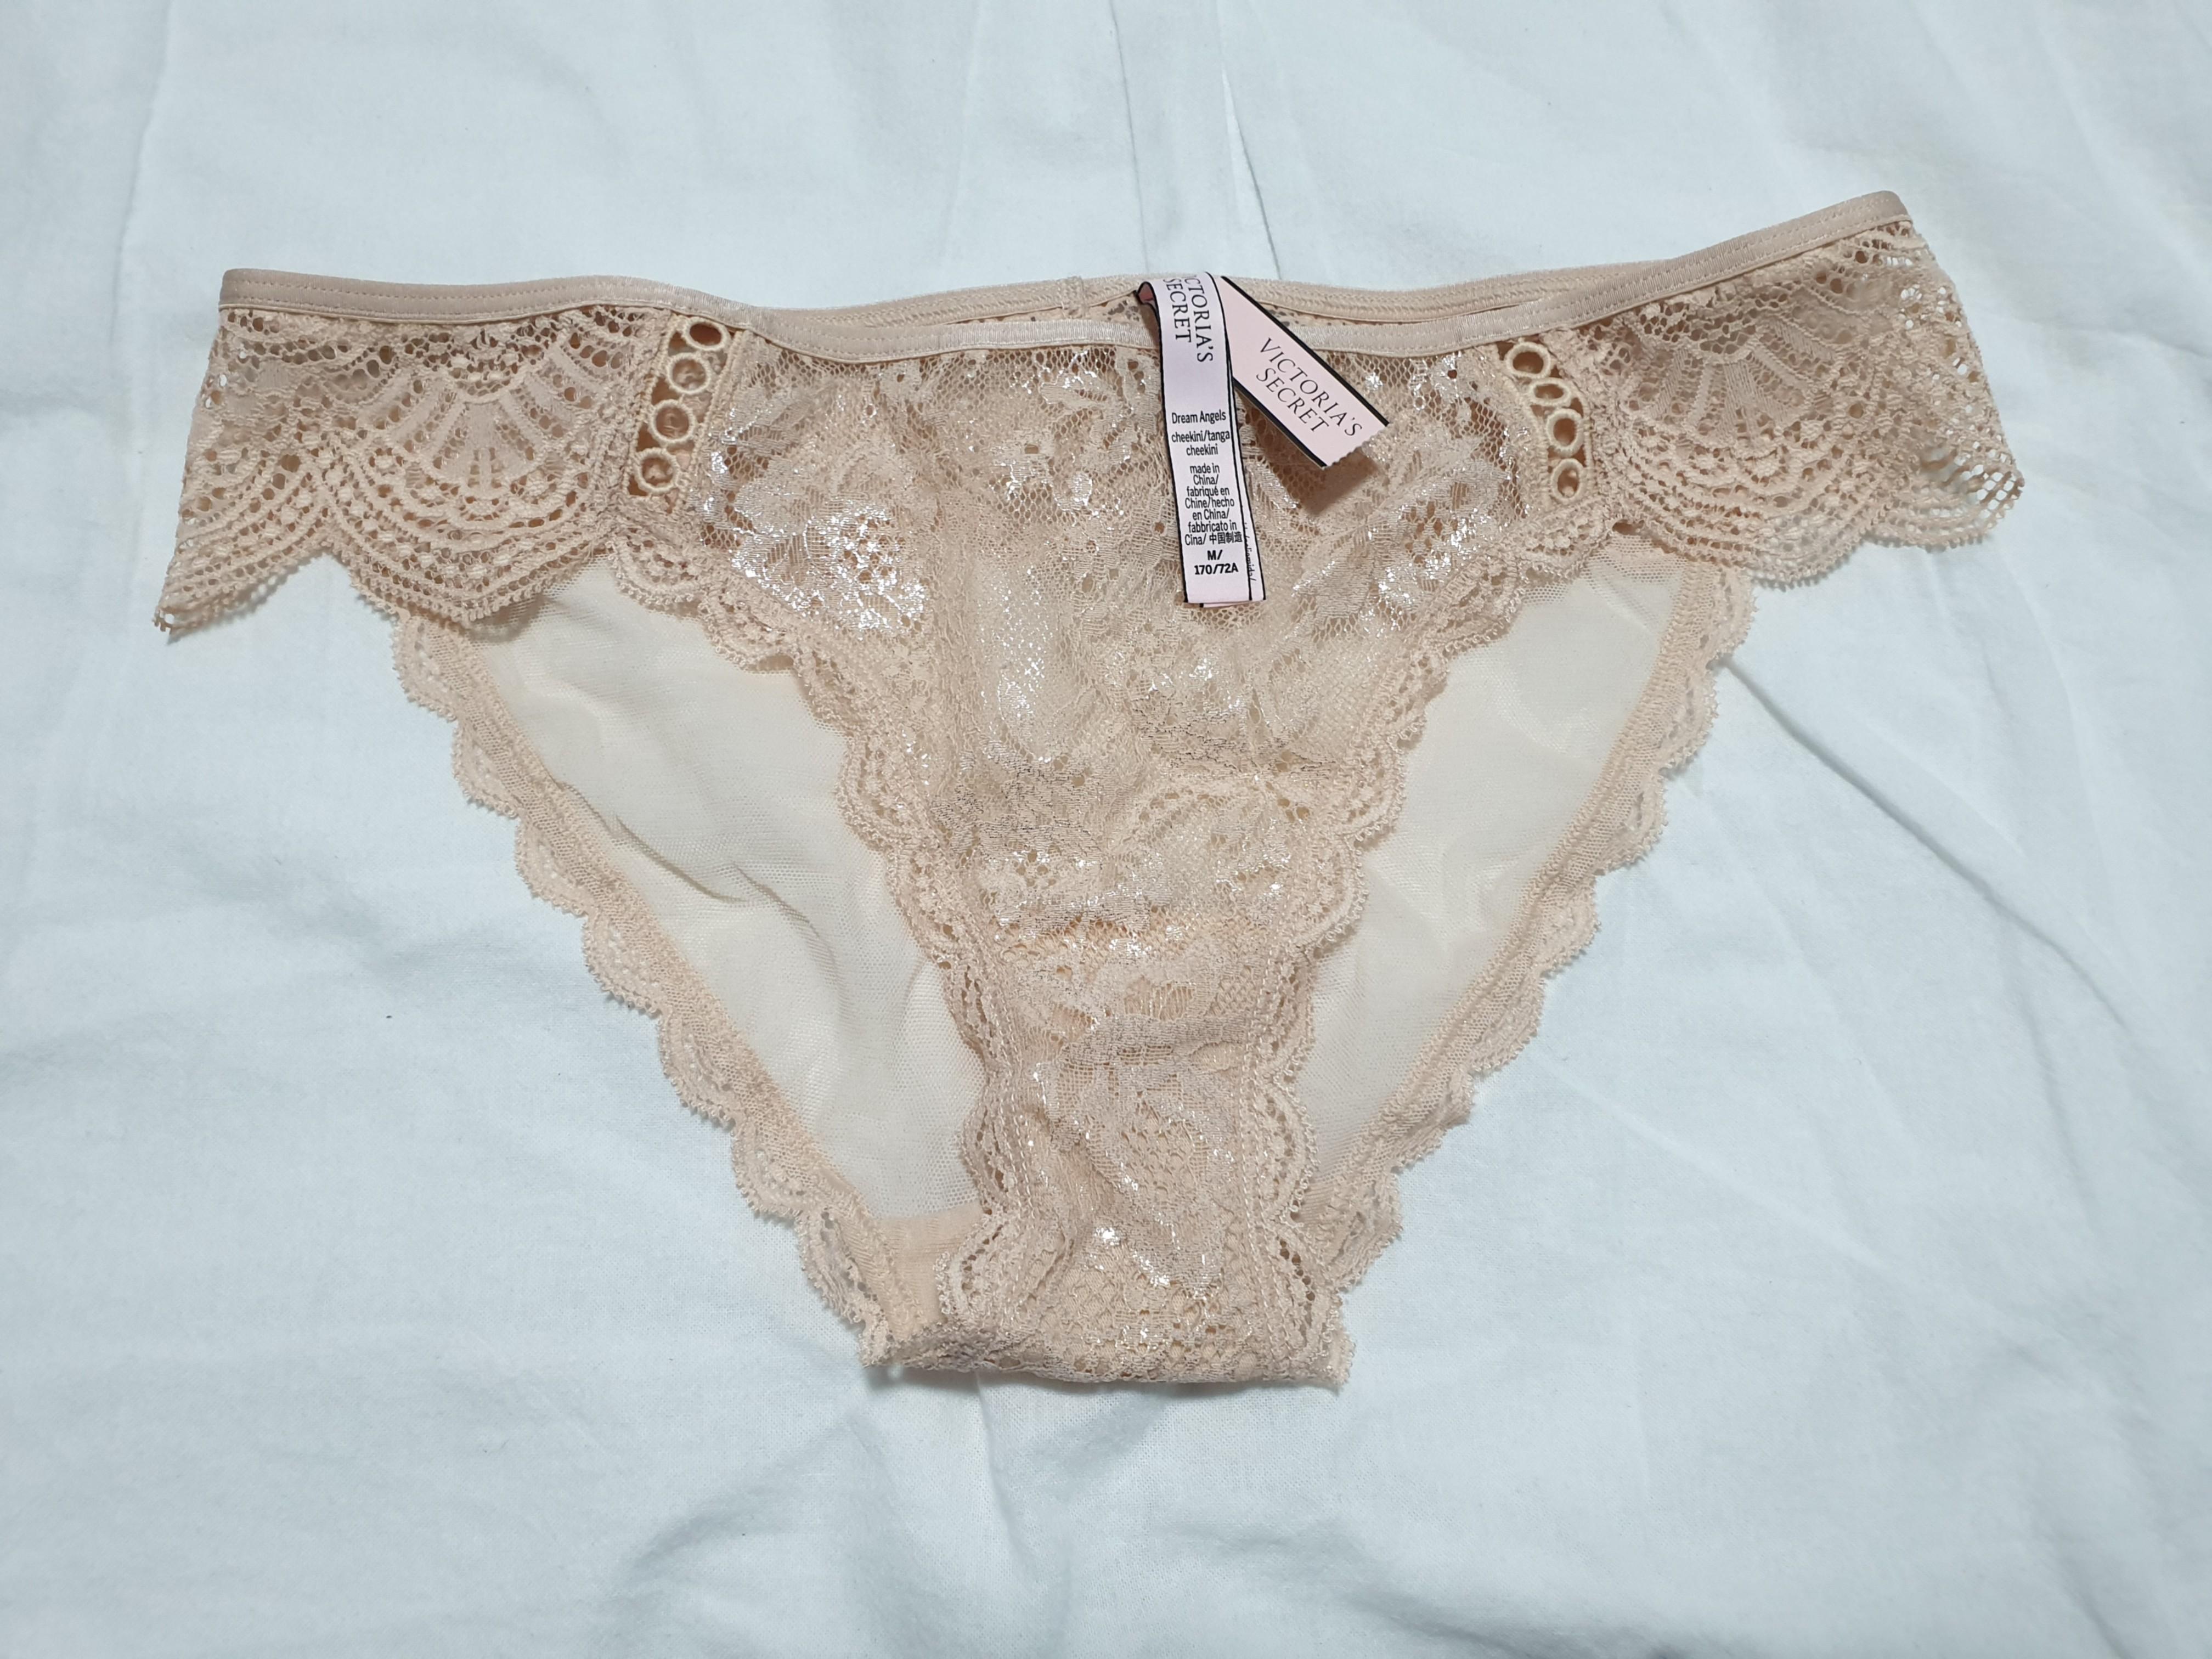 c4d5958b3915 Victoria Secret Dream Angels Underwear, Women's Fashion, Clothes ...